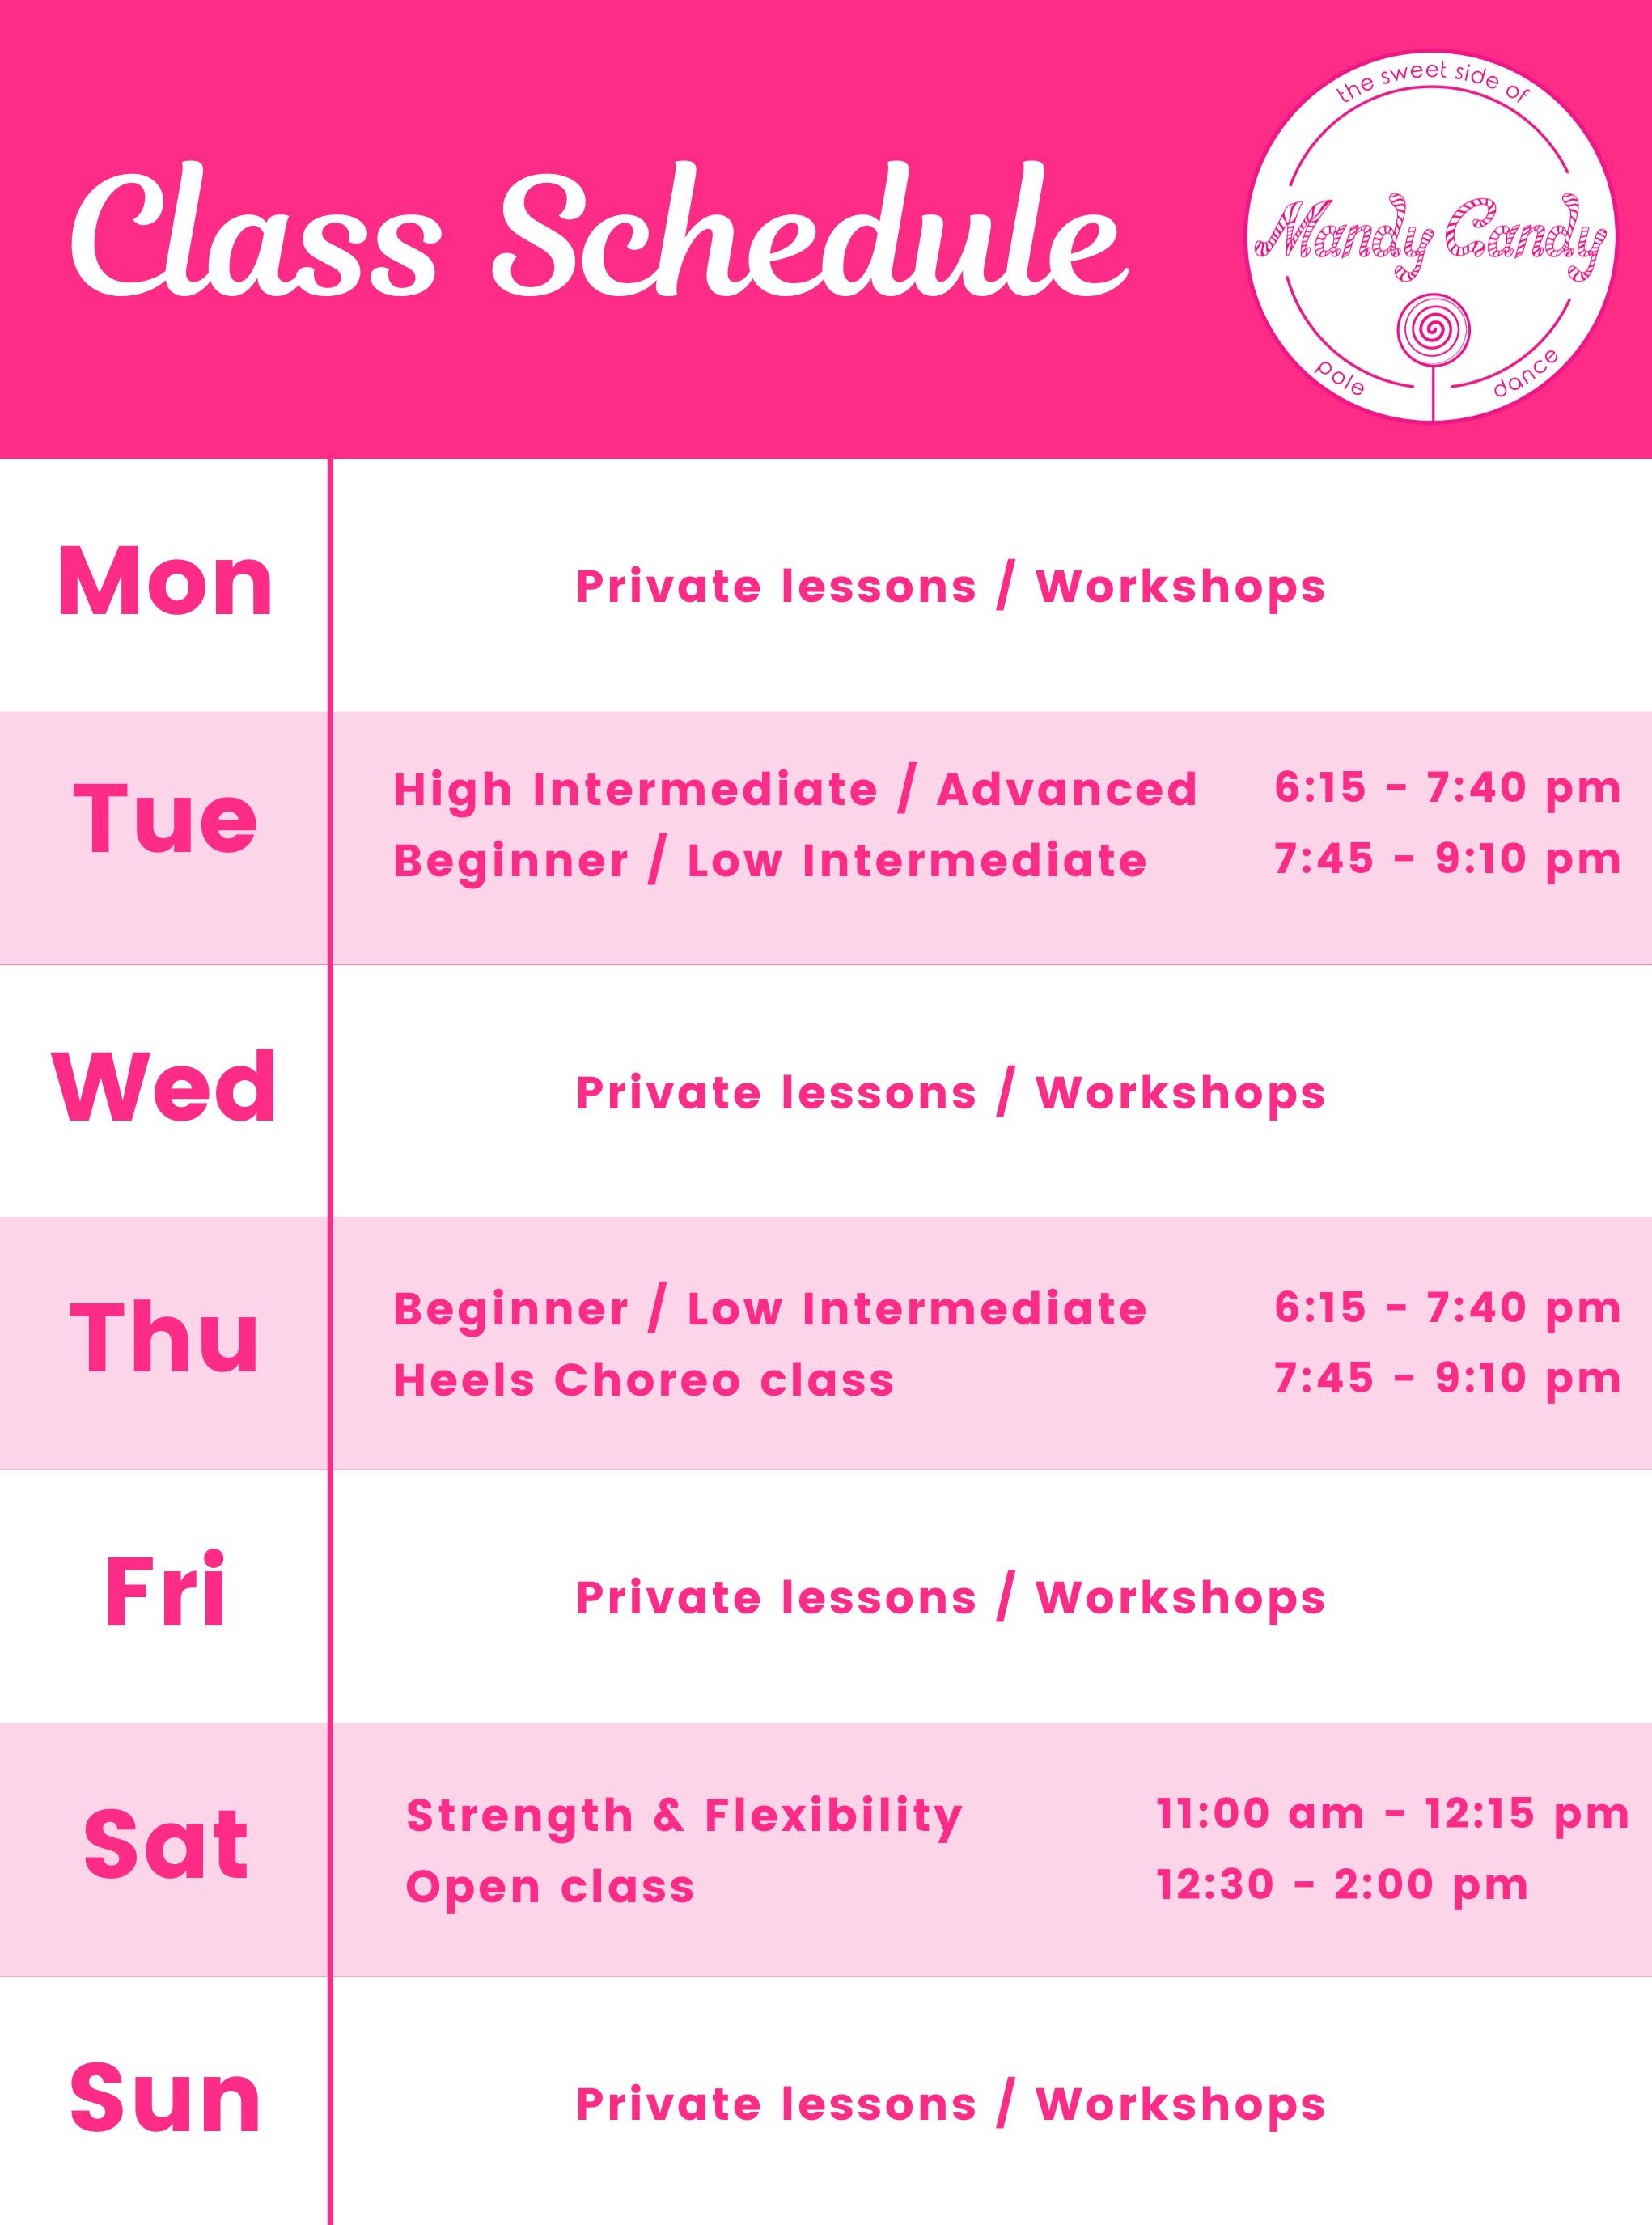 New class schedule September 2021 Mandy Candy's Pole Dance Studio